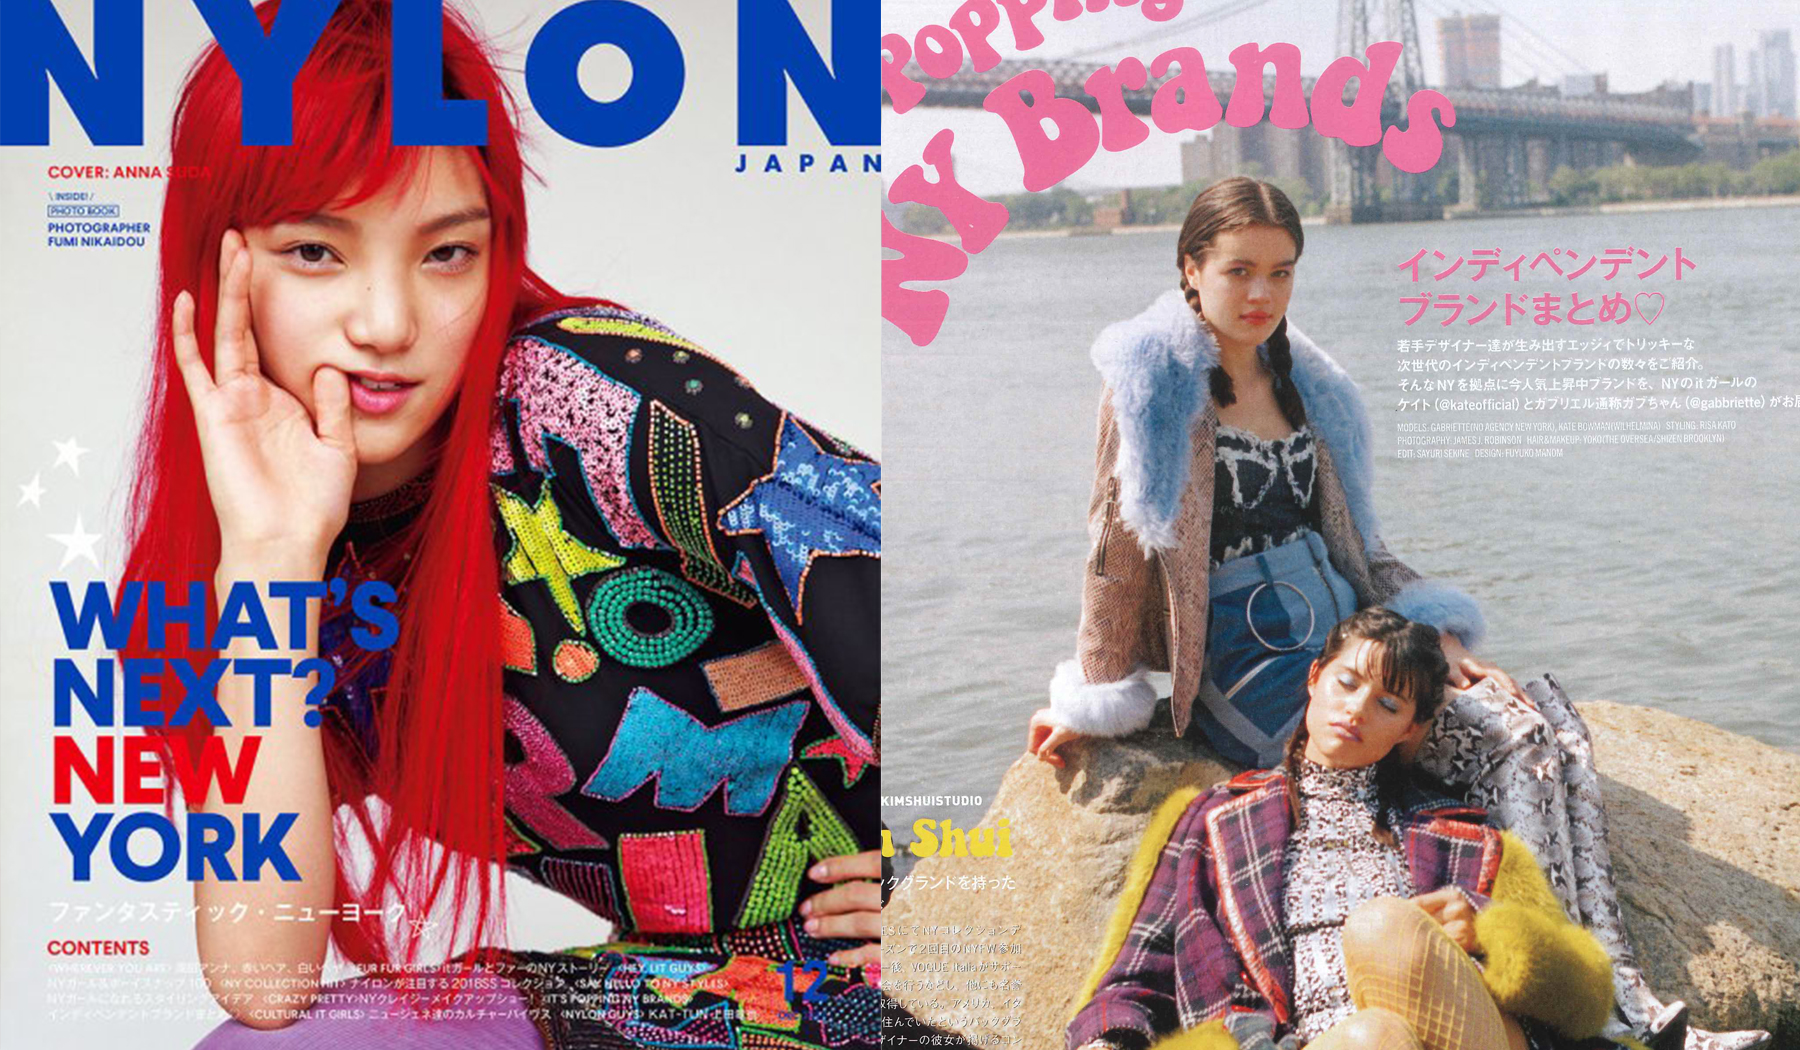 nylon_cover_nyc.jpg